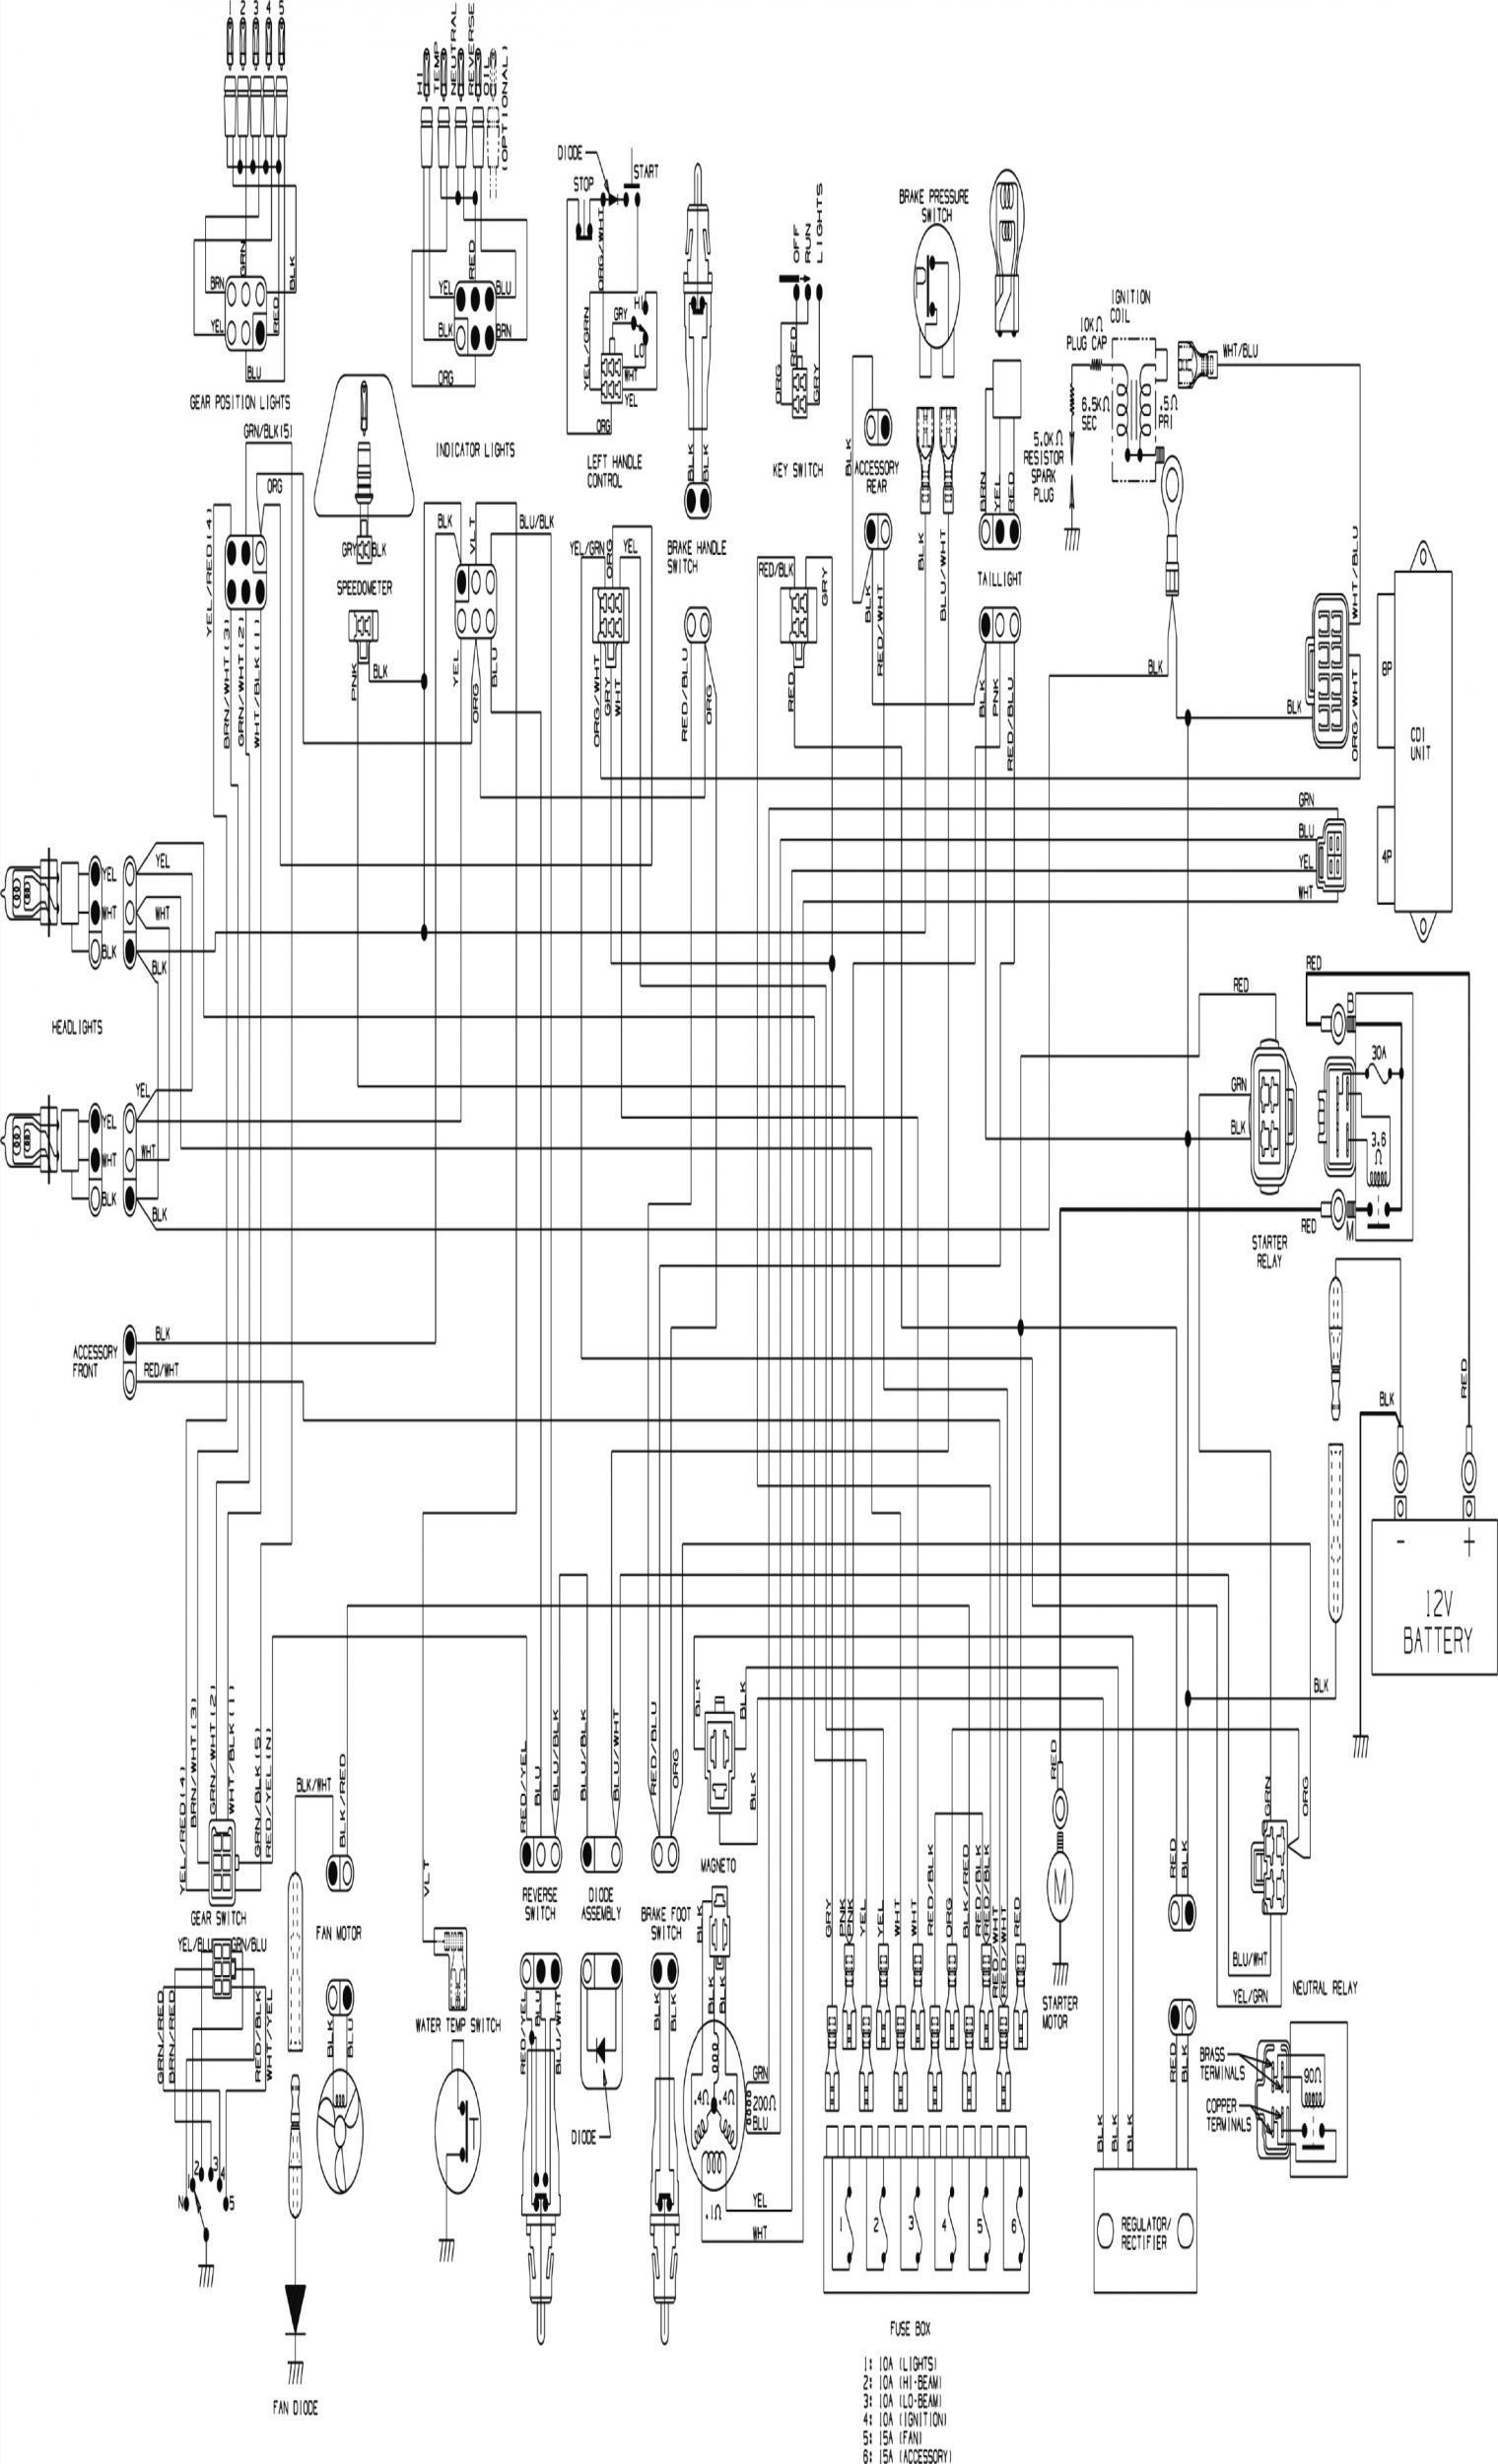 Arctic Cat 400 Atv Wiring Diagram For 89 Chevy Pickup Wiring Diagram Free Picture 7ways Yenpancane Jeanjaures37 Fr